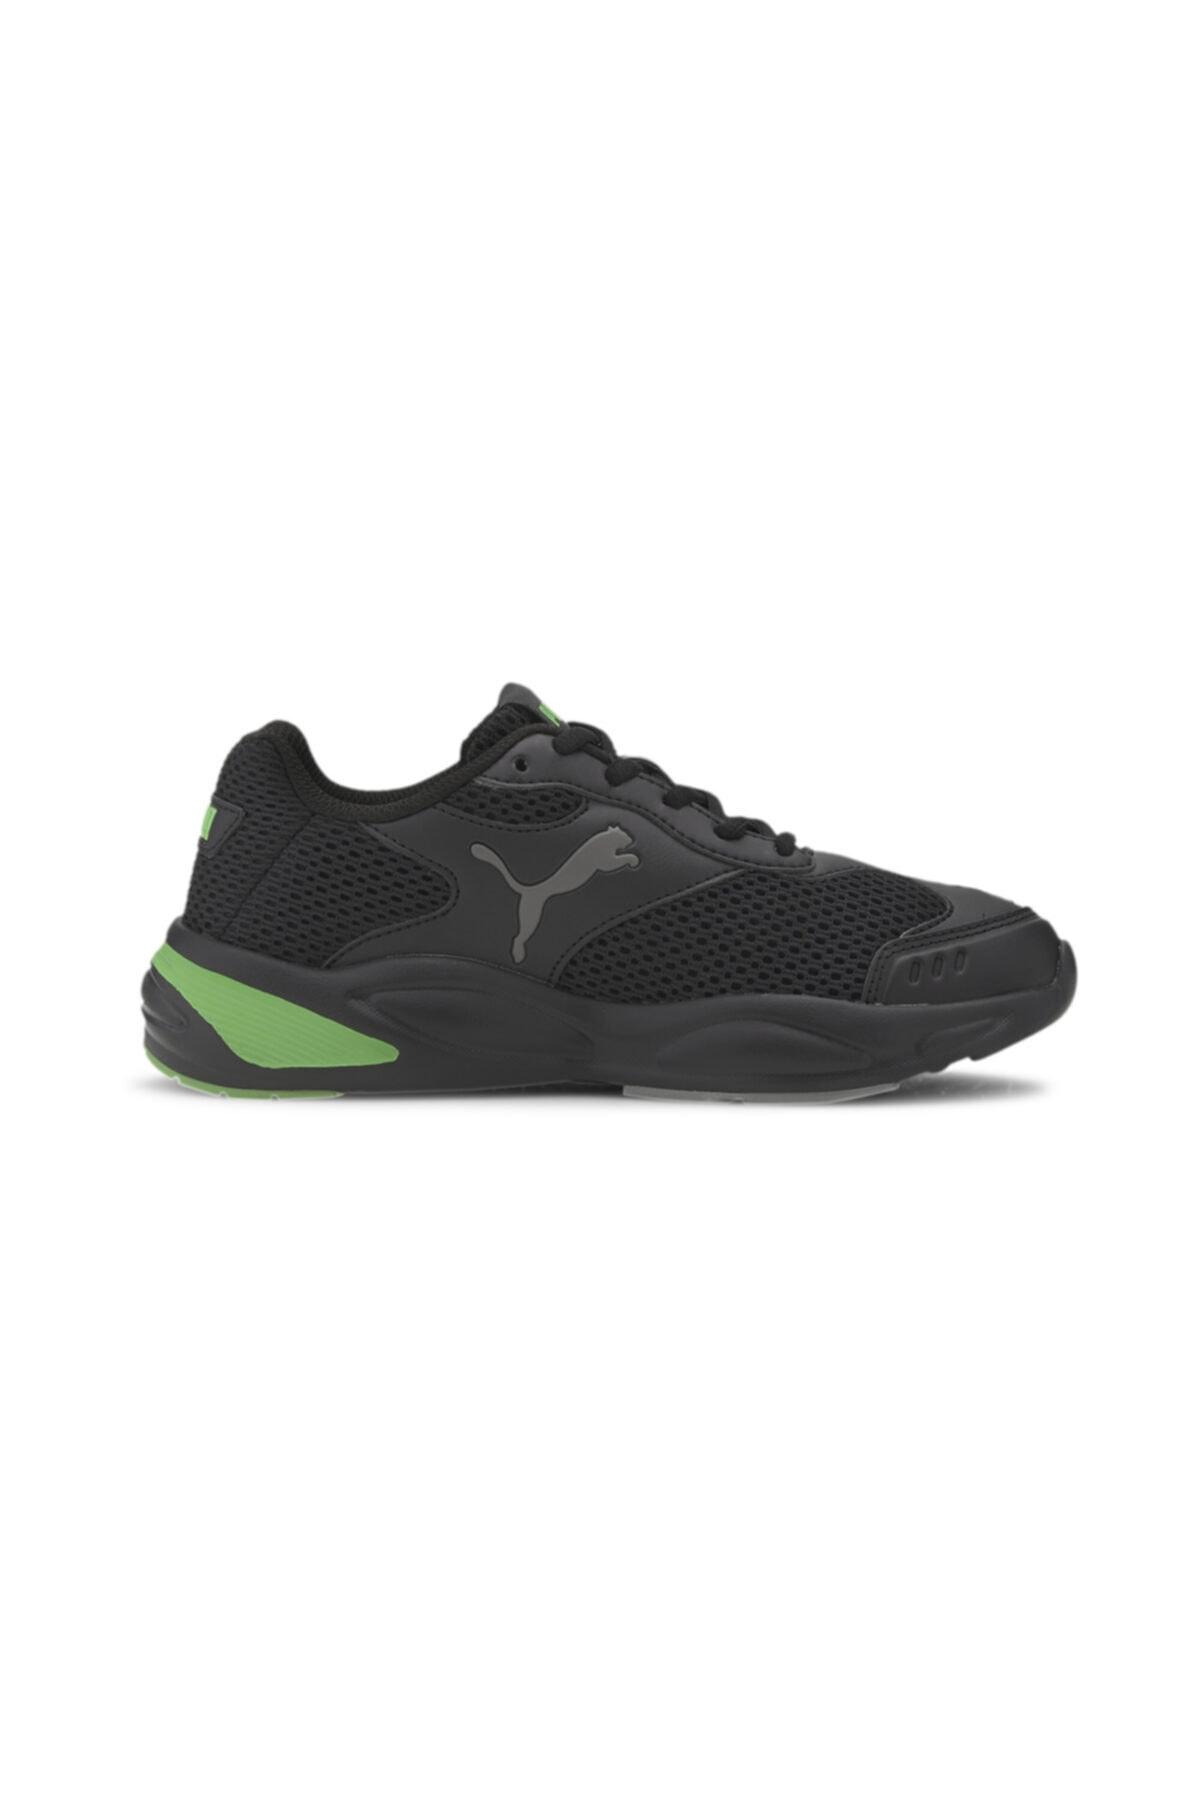 Puma Kadın Siyah 90s Runner Mesh Jr  Ayakkabı 37292605 1